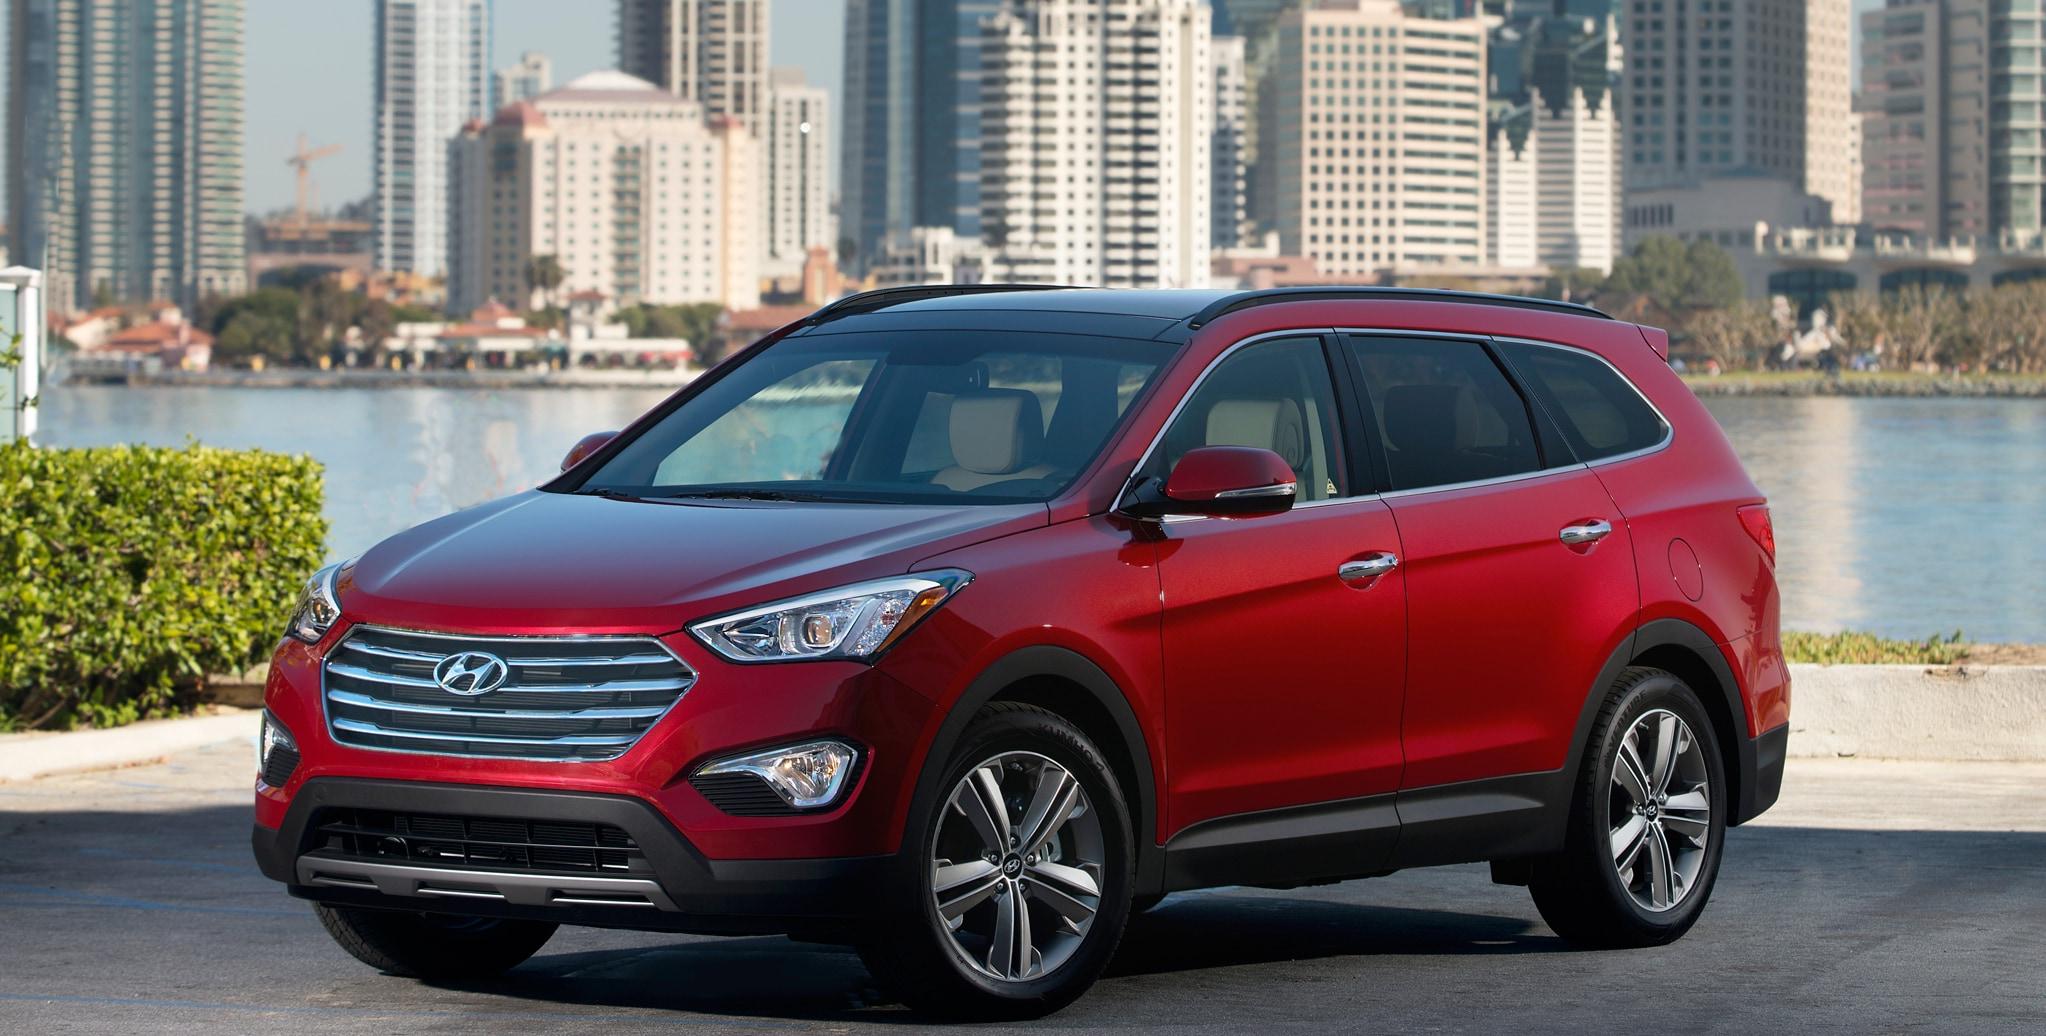 Hyundai Santa Fe India, Price, Review, Images - Hyundai Cars